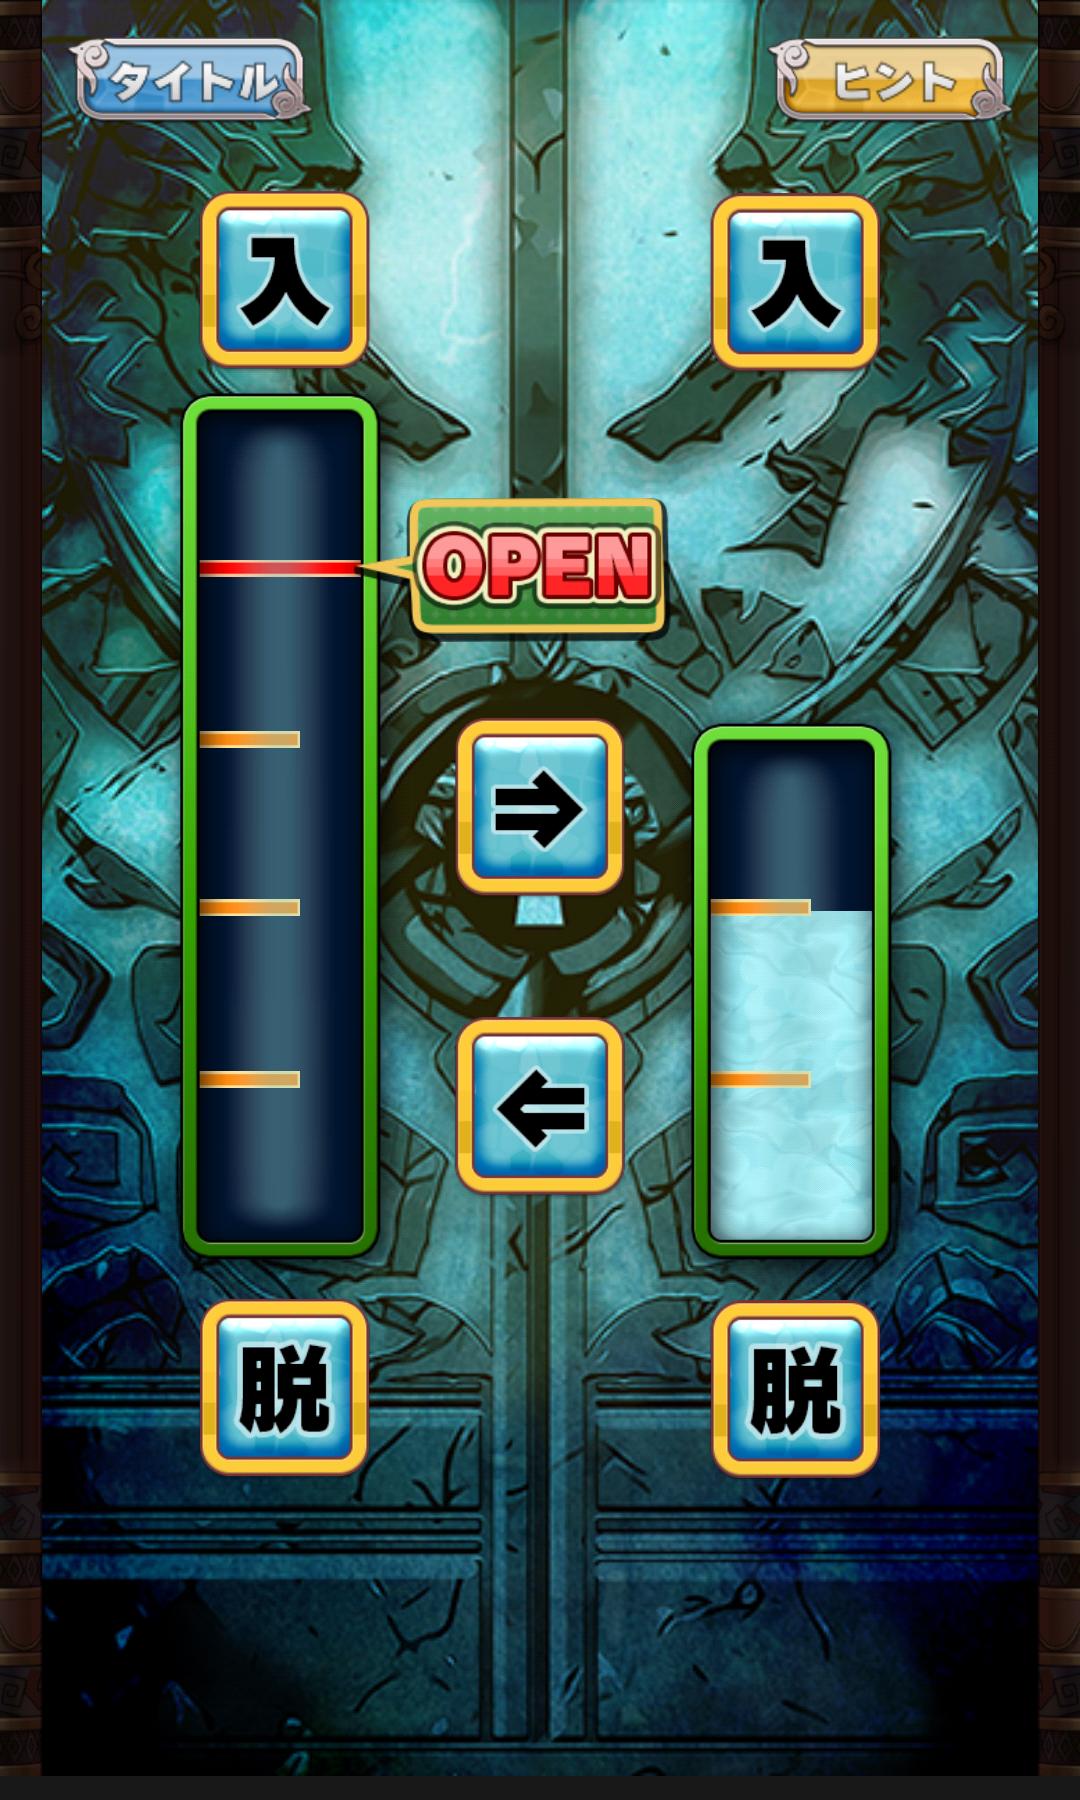 androidアプリ アニモン 人魚姫マーメの冒険攻略スクリーンショット4